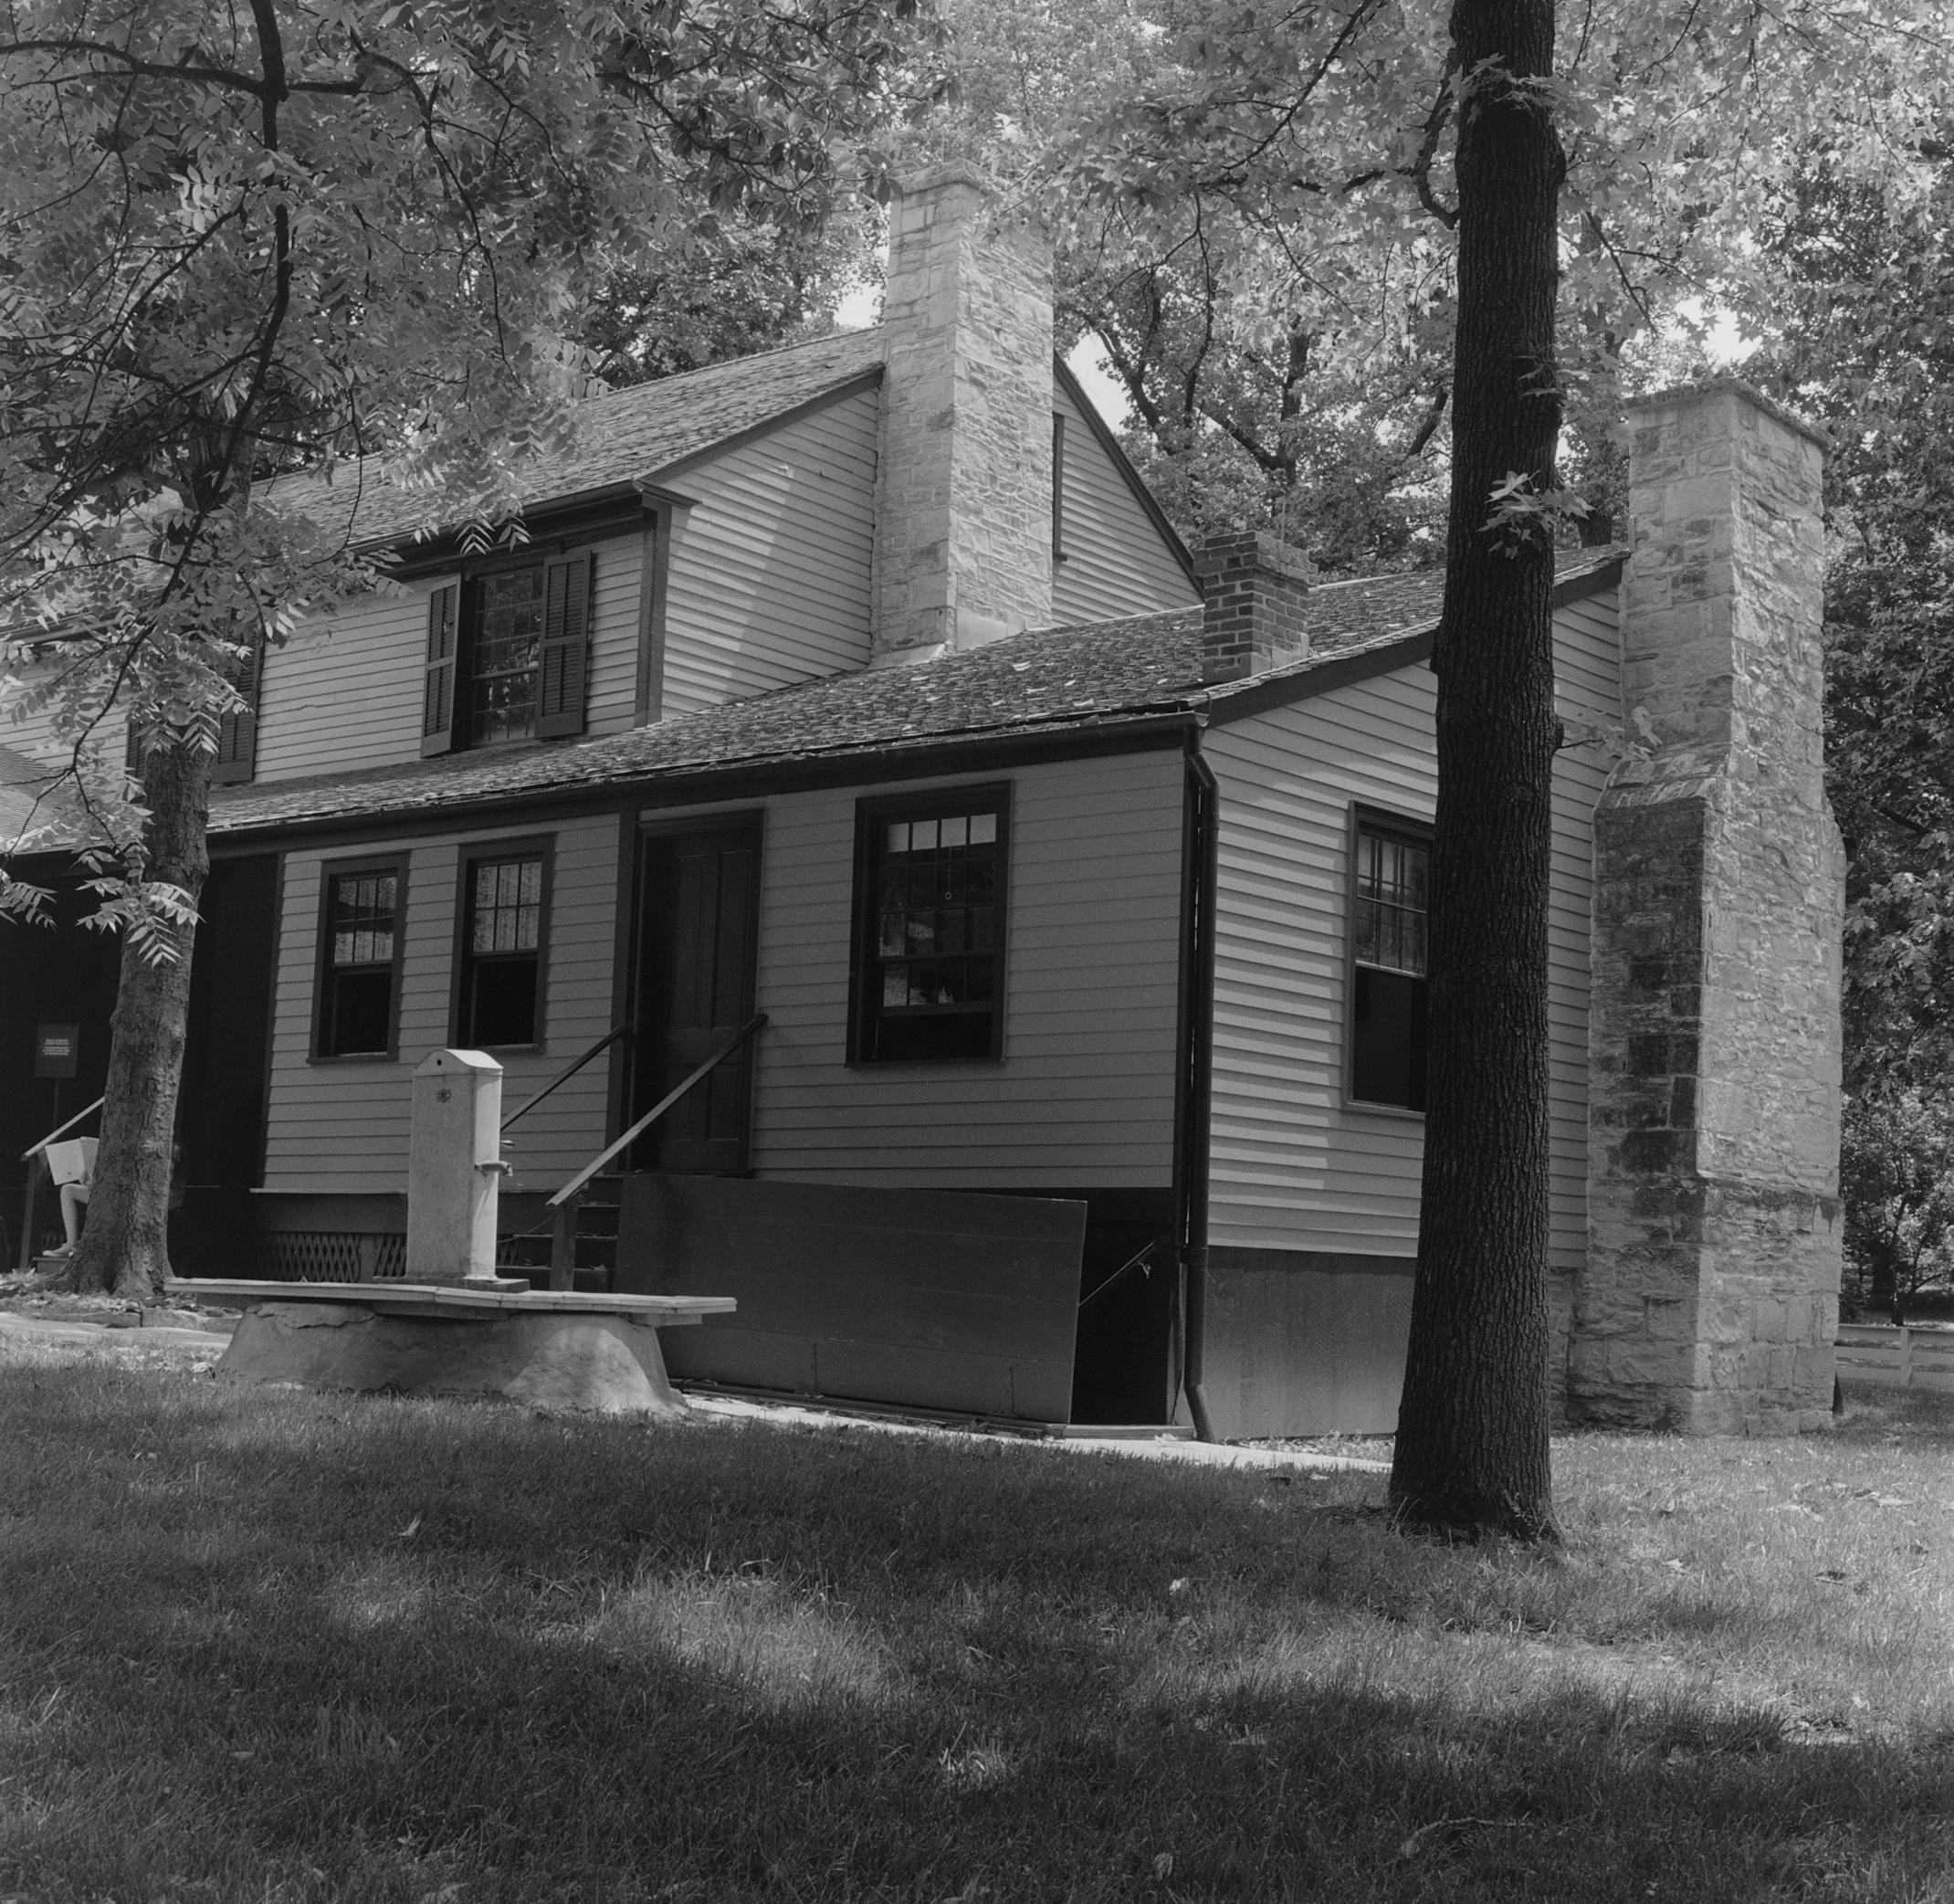 US Grant's Farm, Exterior with Kitchen, St. Louis, Missouri, 2010